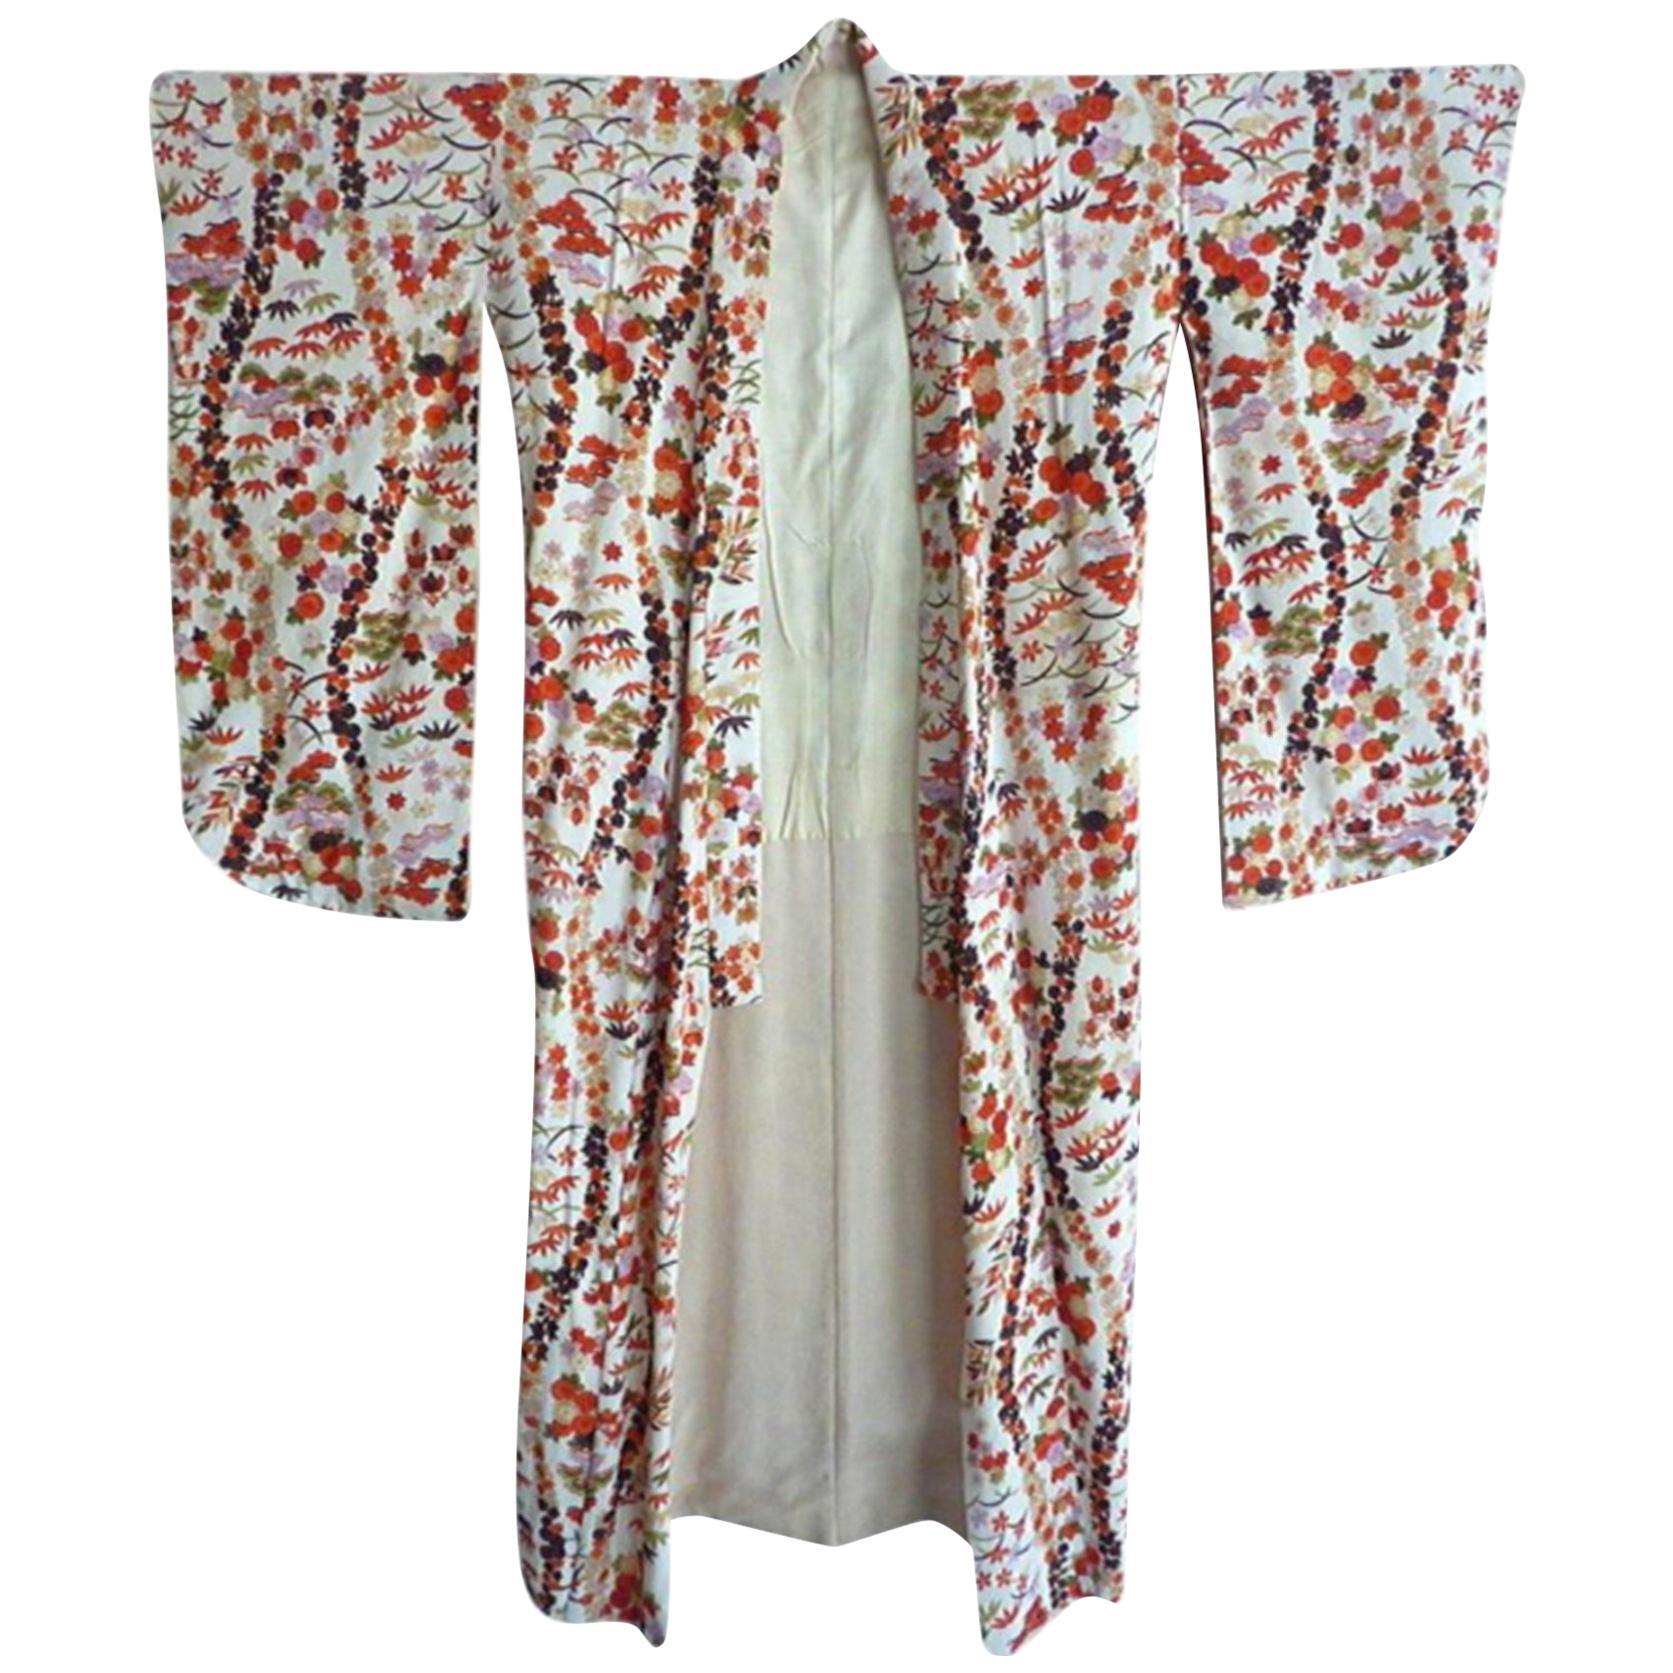 Vintage Cherry blossom Japanese pink red gold hand-painted Ecru Silk Kimono